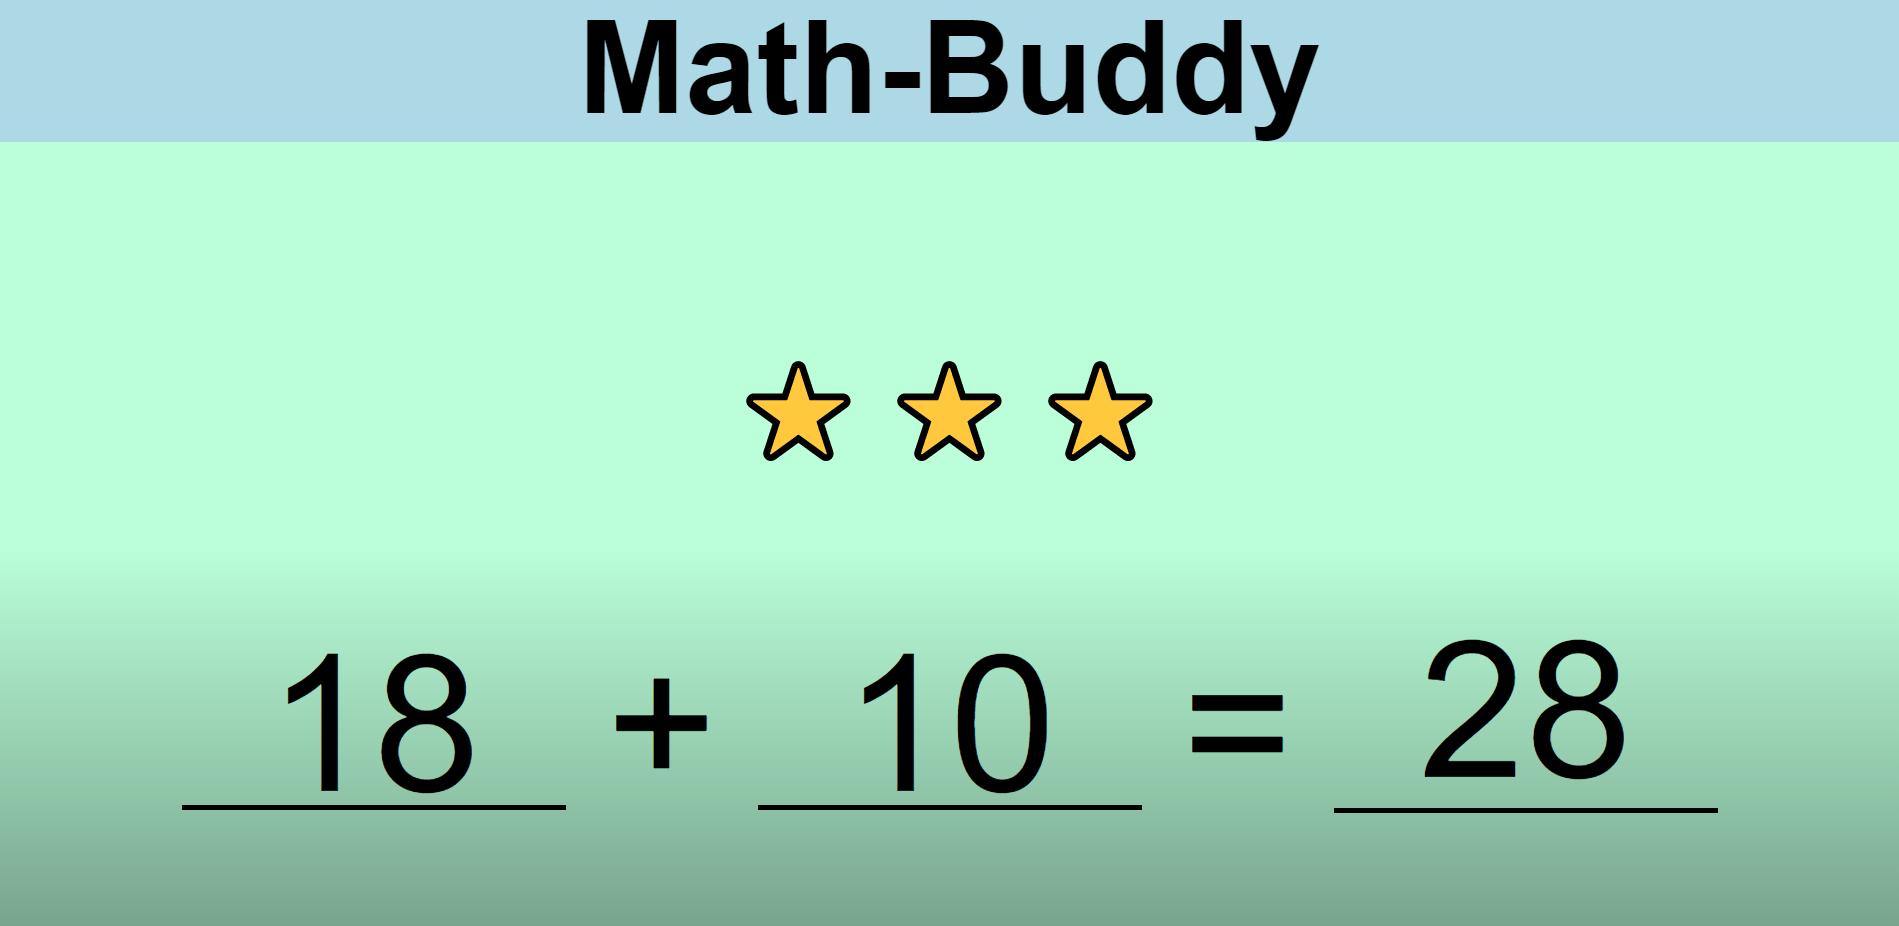 image of math app